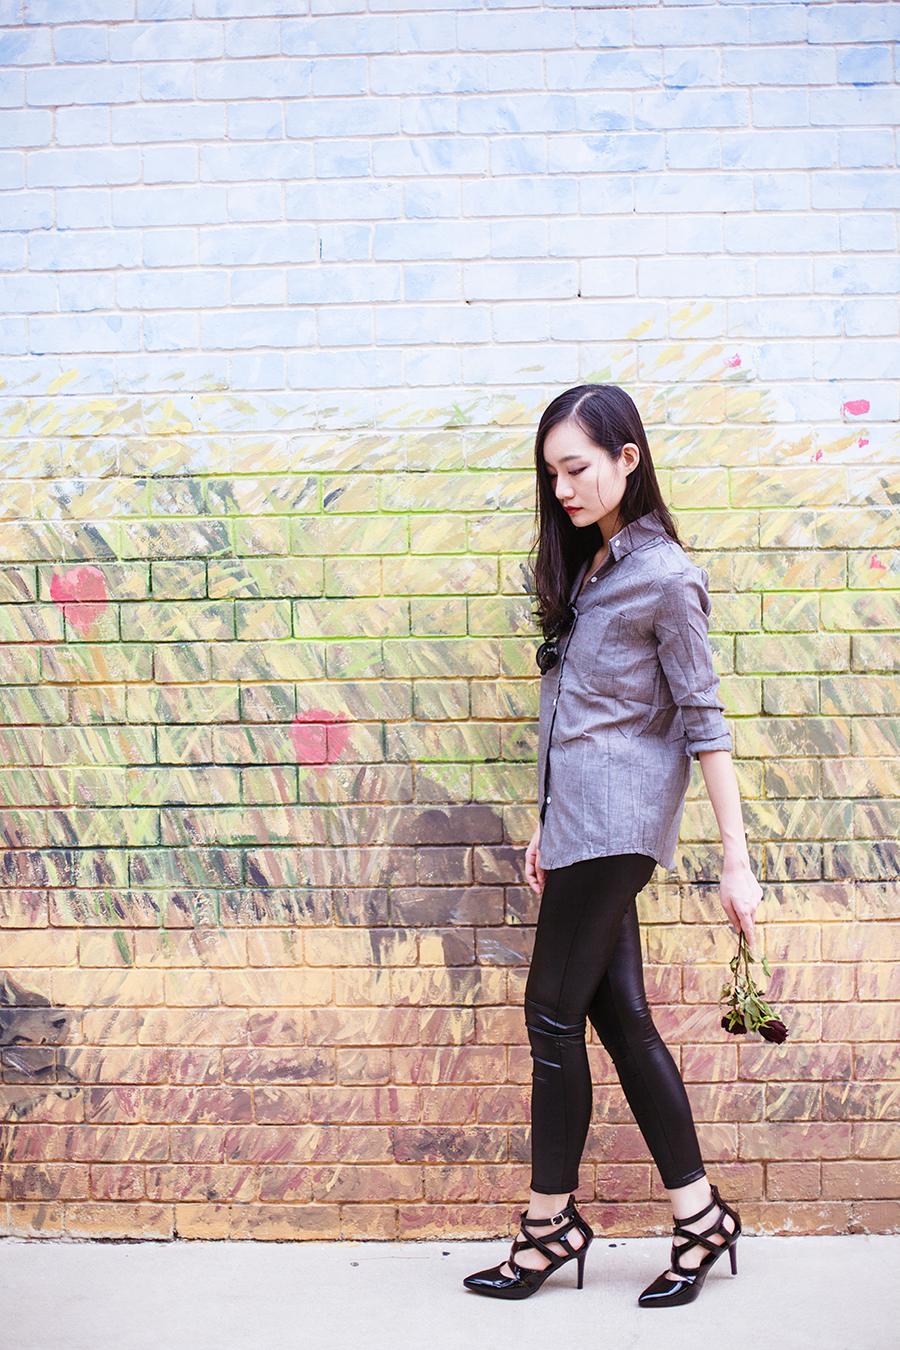 Dressgal grey linen shirt, Dressgal PU leggings, Sidewalk strappy heels via Zalora, 24:01 black round sunglasses via Zalora.